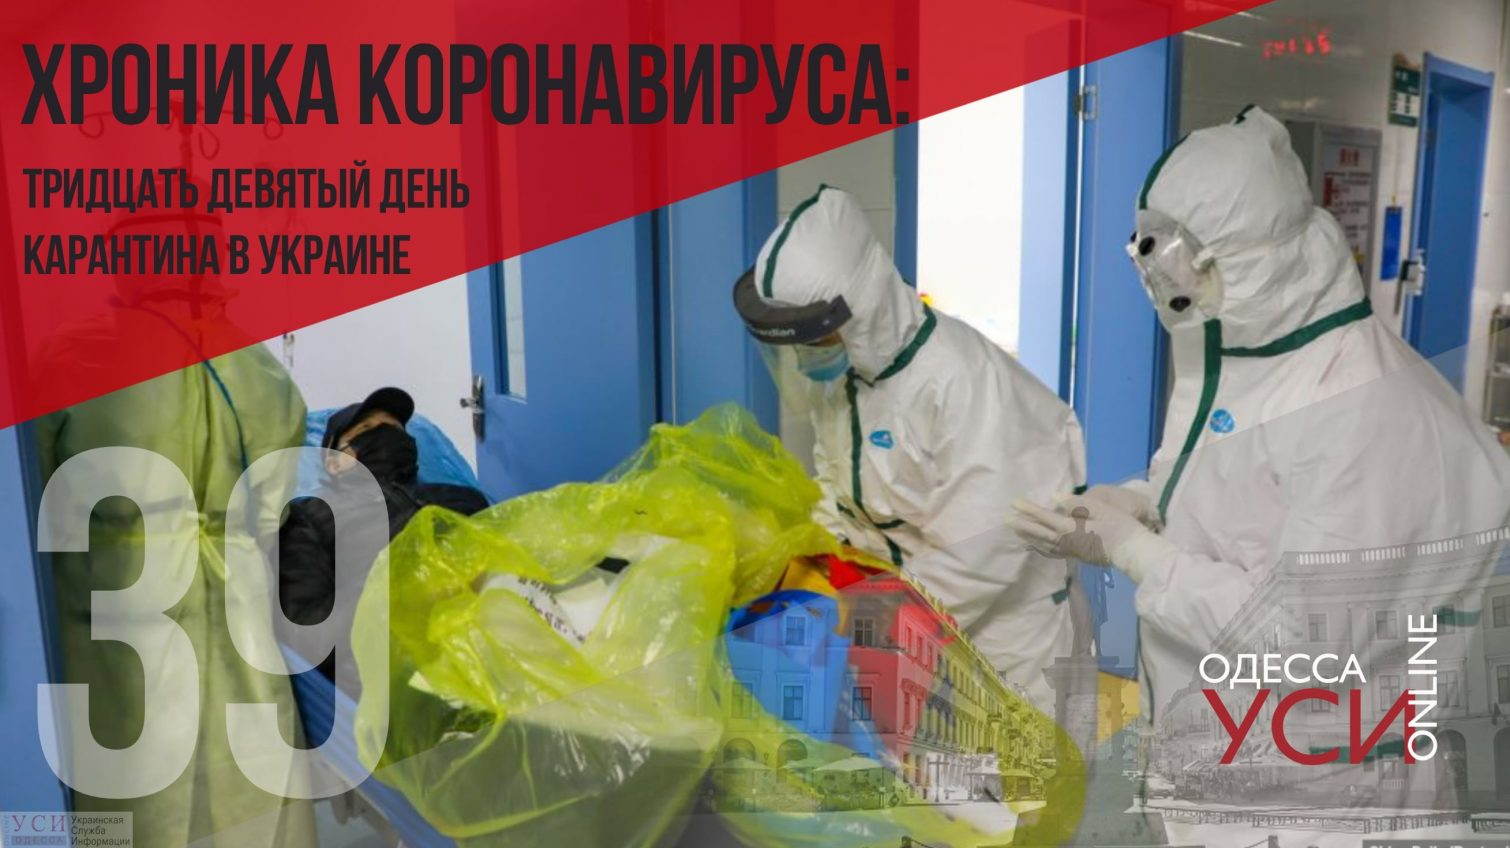 Хроника коронавируса: 39 дней с начала карантина в Украине (ОБНОВЛЯЕТСЯ) «фото»